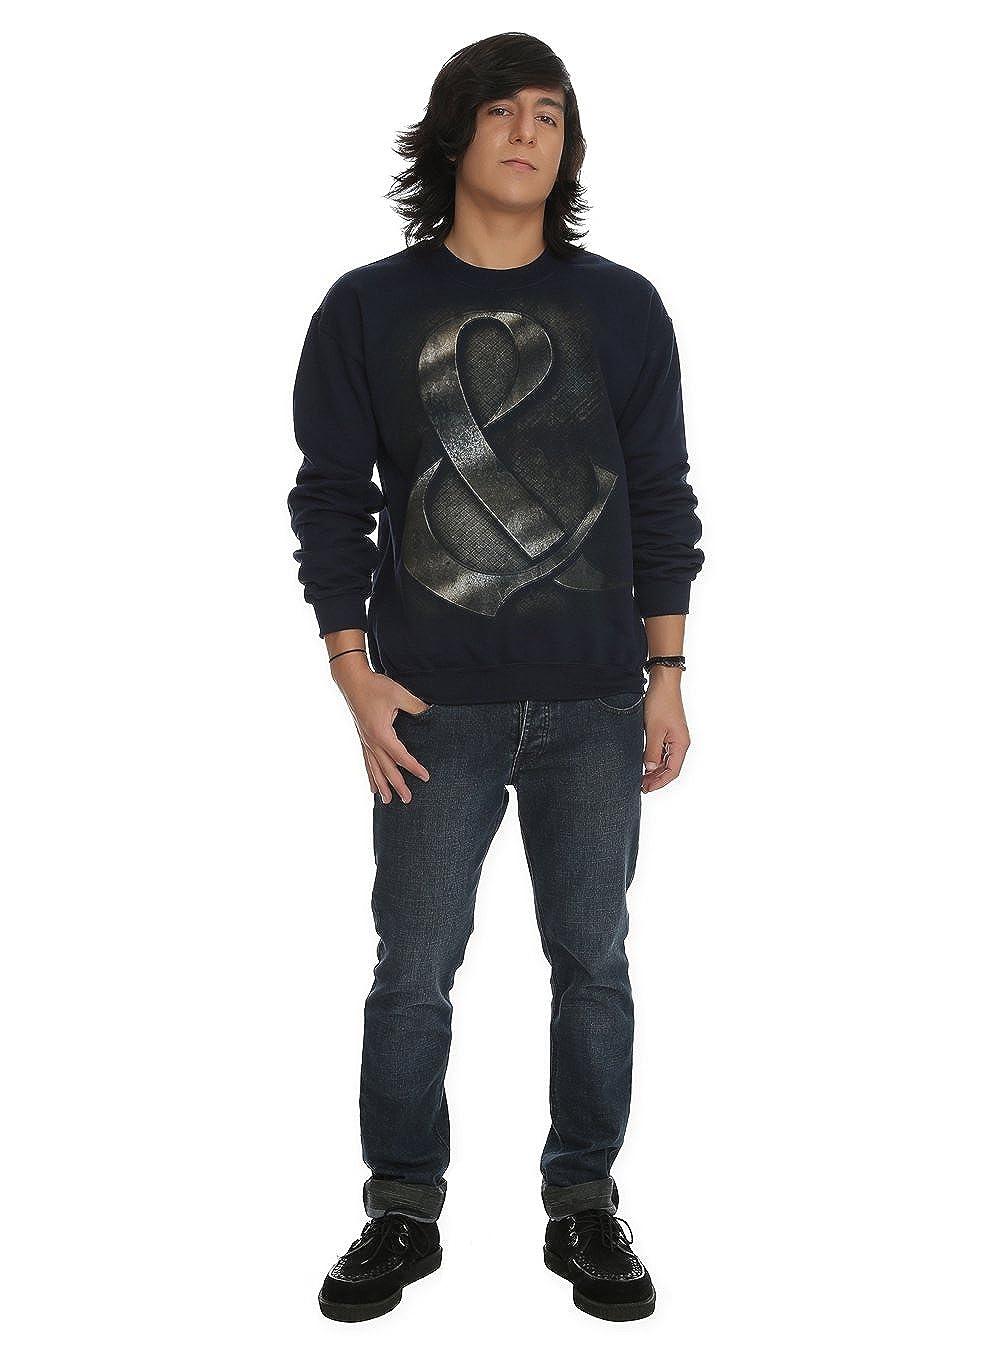 XX-Large Of Mice and /& Men Crew Neck Sweatshirt Steel Style Amperstand Image